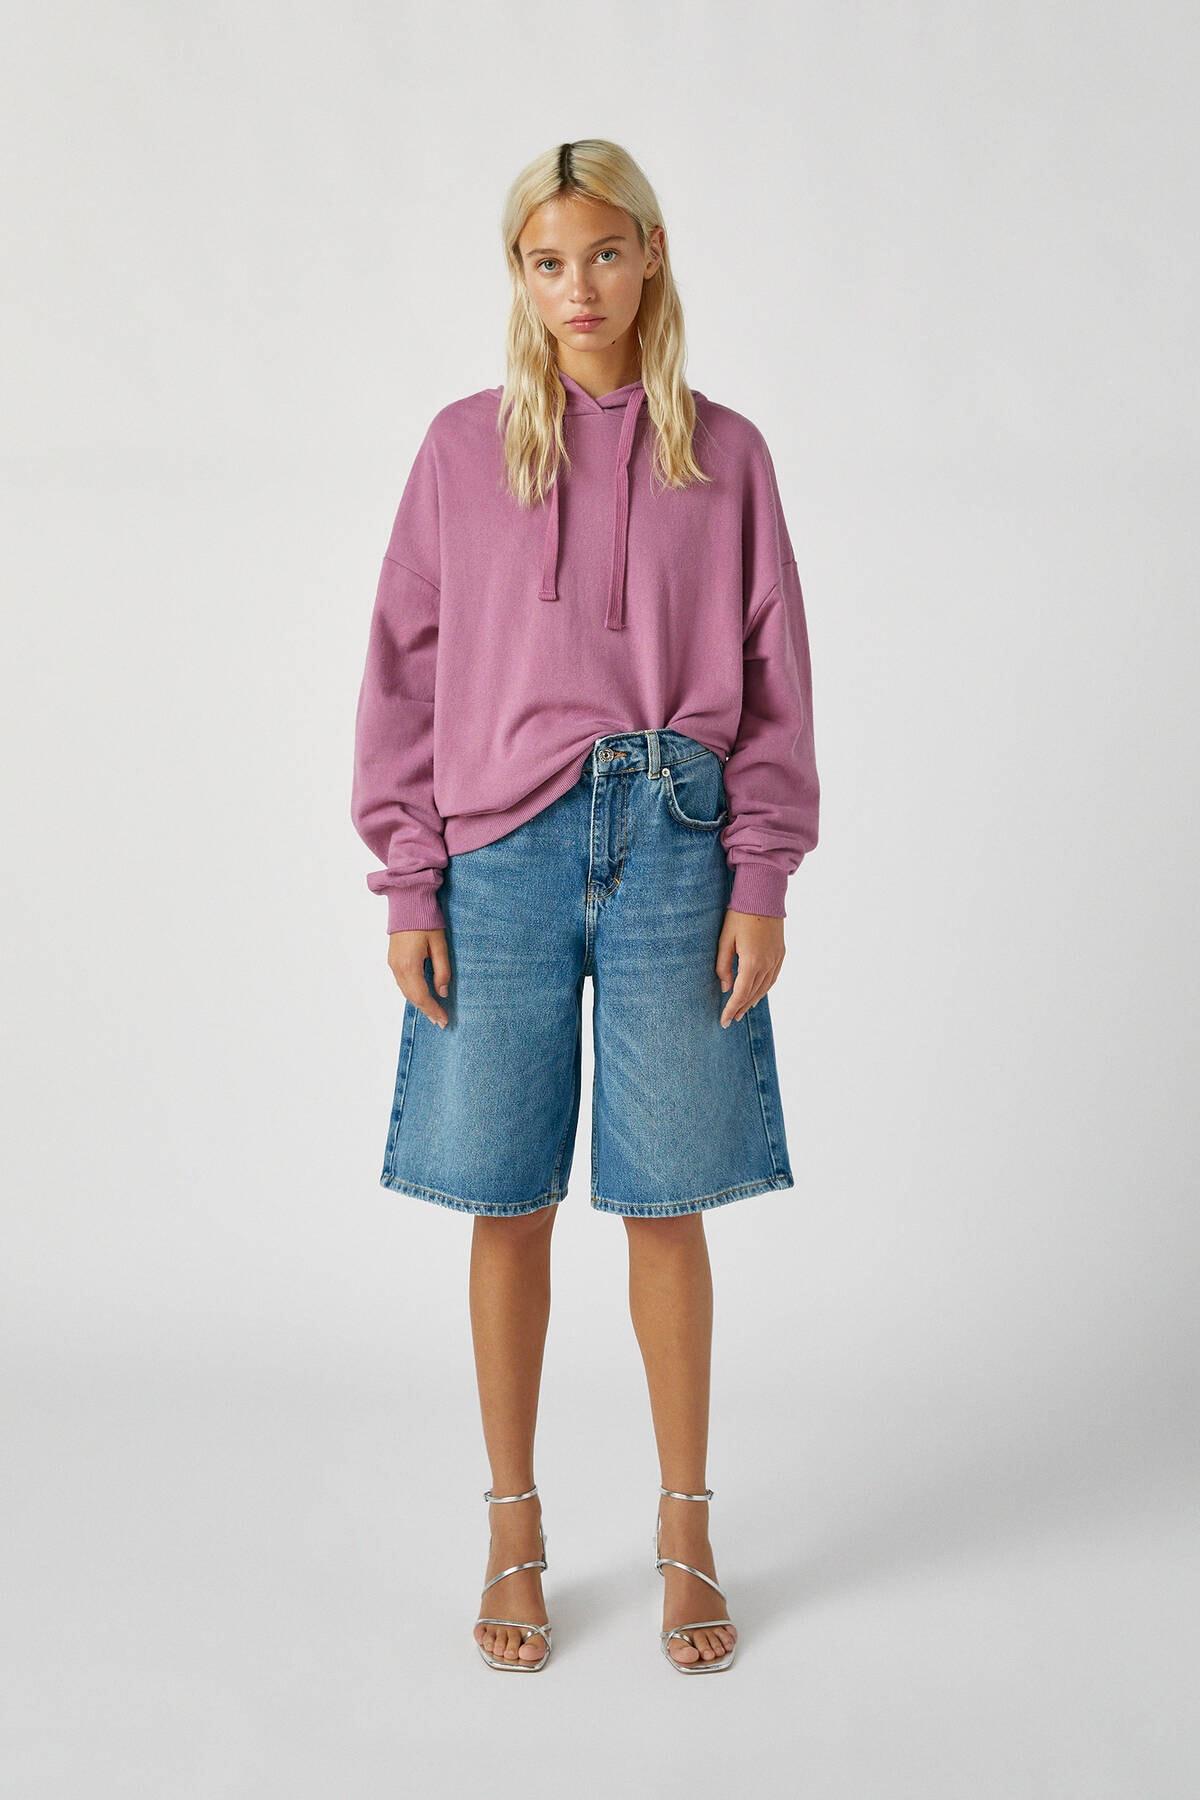 Pull & Bear Kadın Mor Renkli Kapüşonlu Sweatshirt 09594312 1